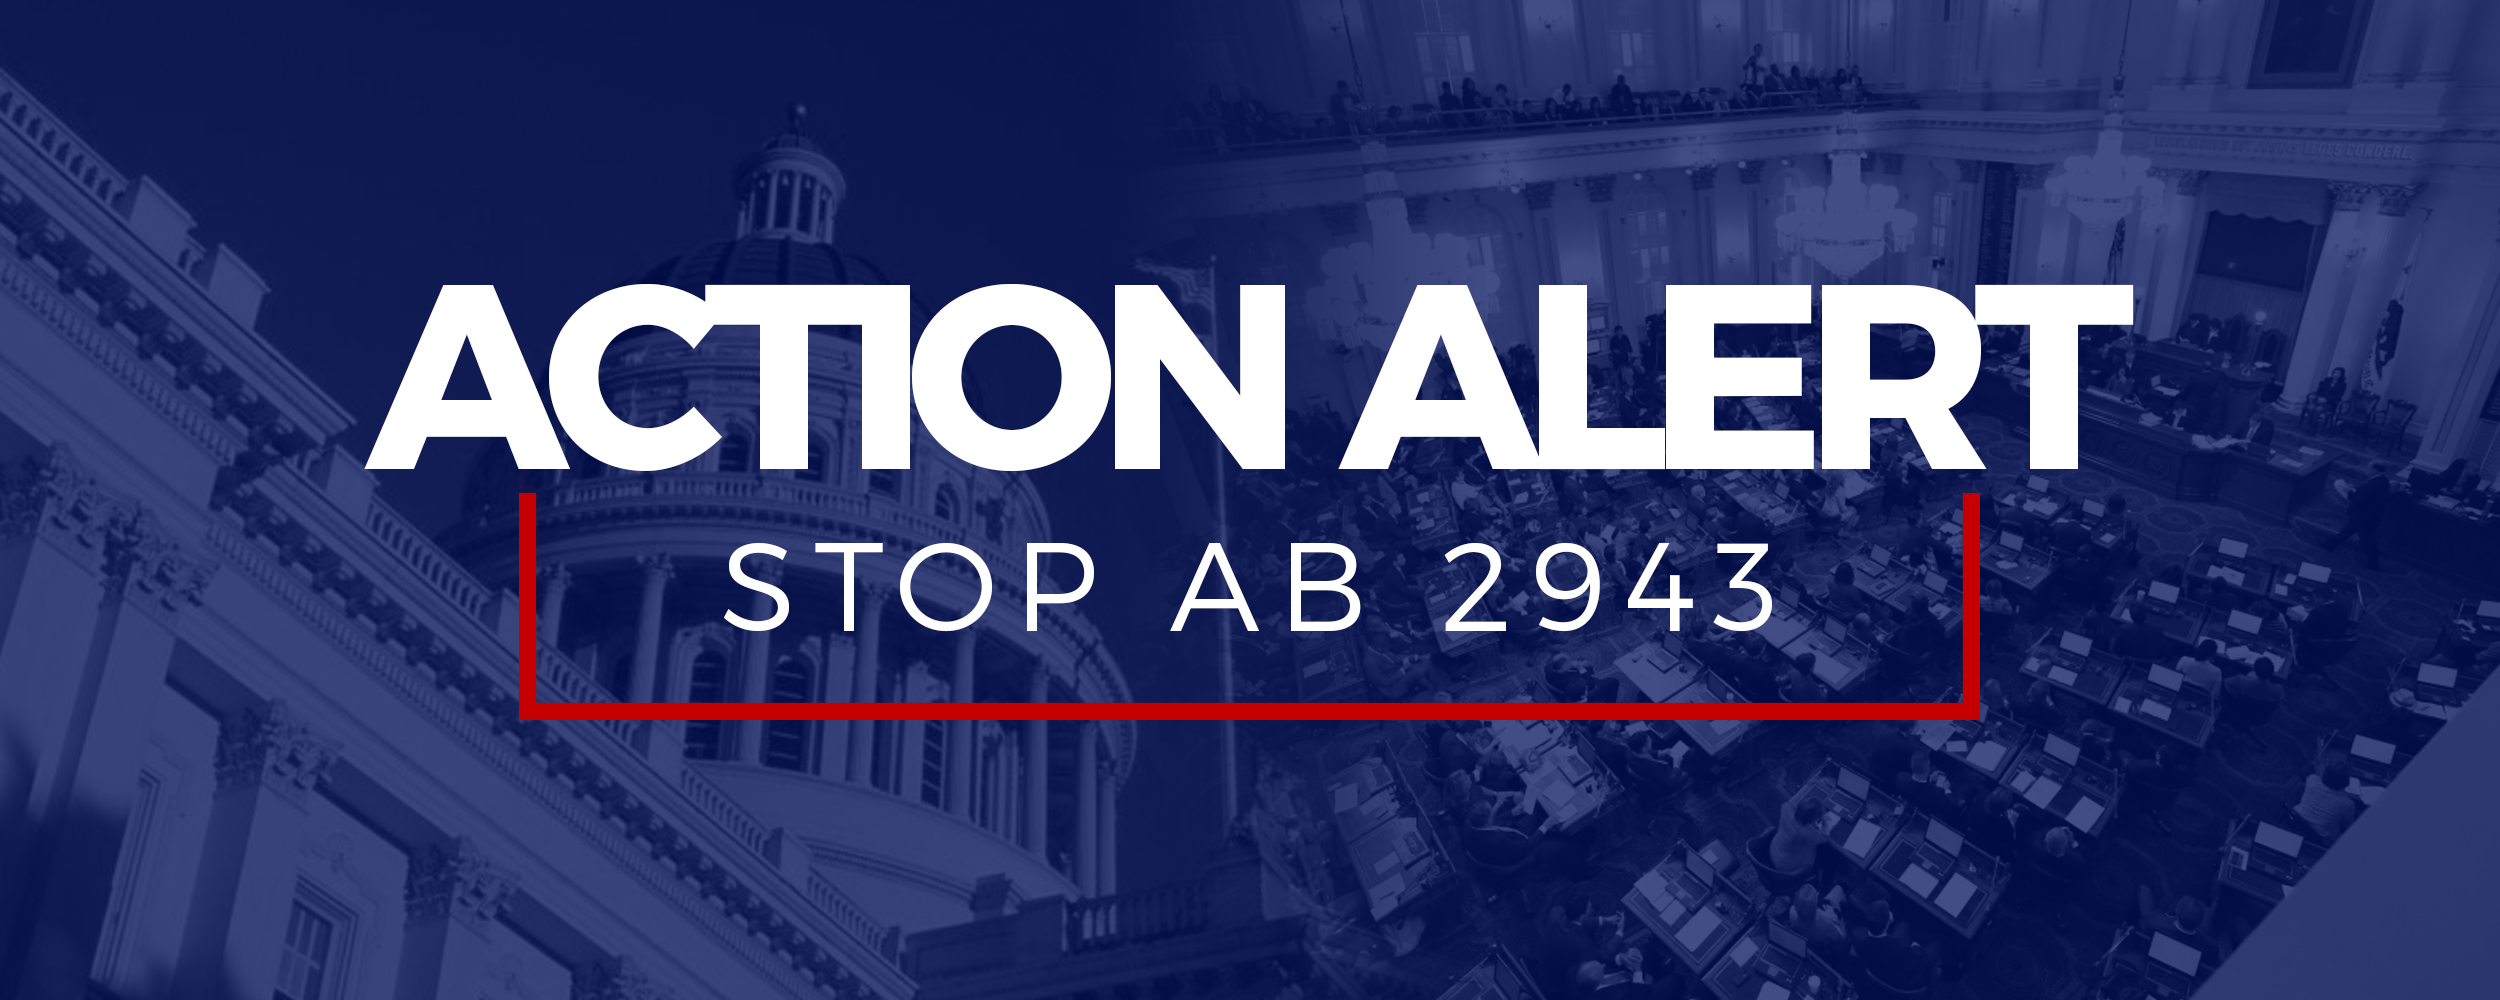 Action Alert Ab2943 copy.jpg